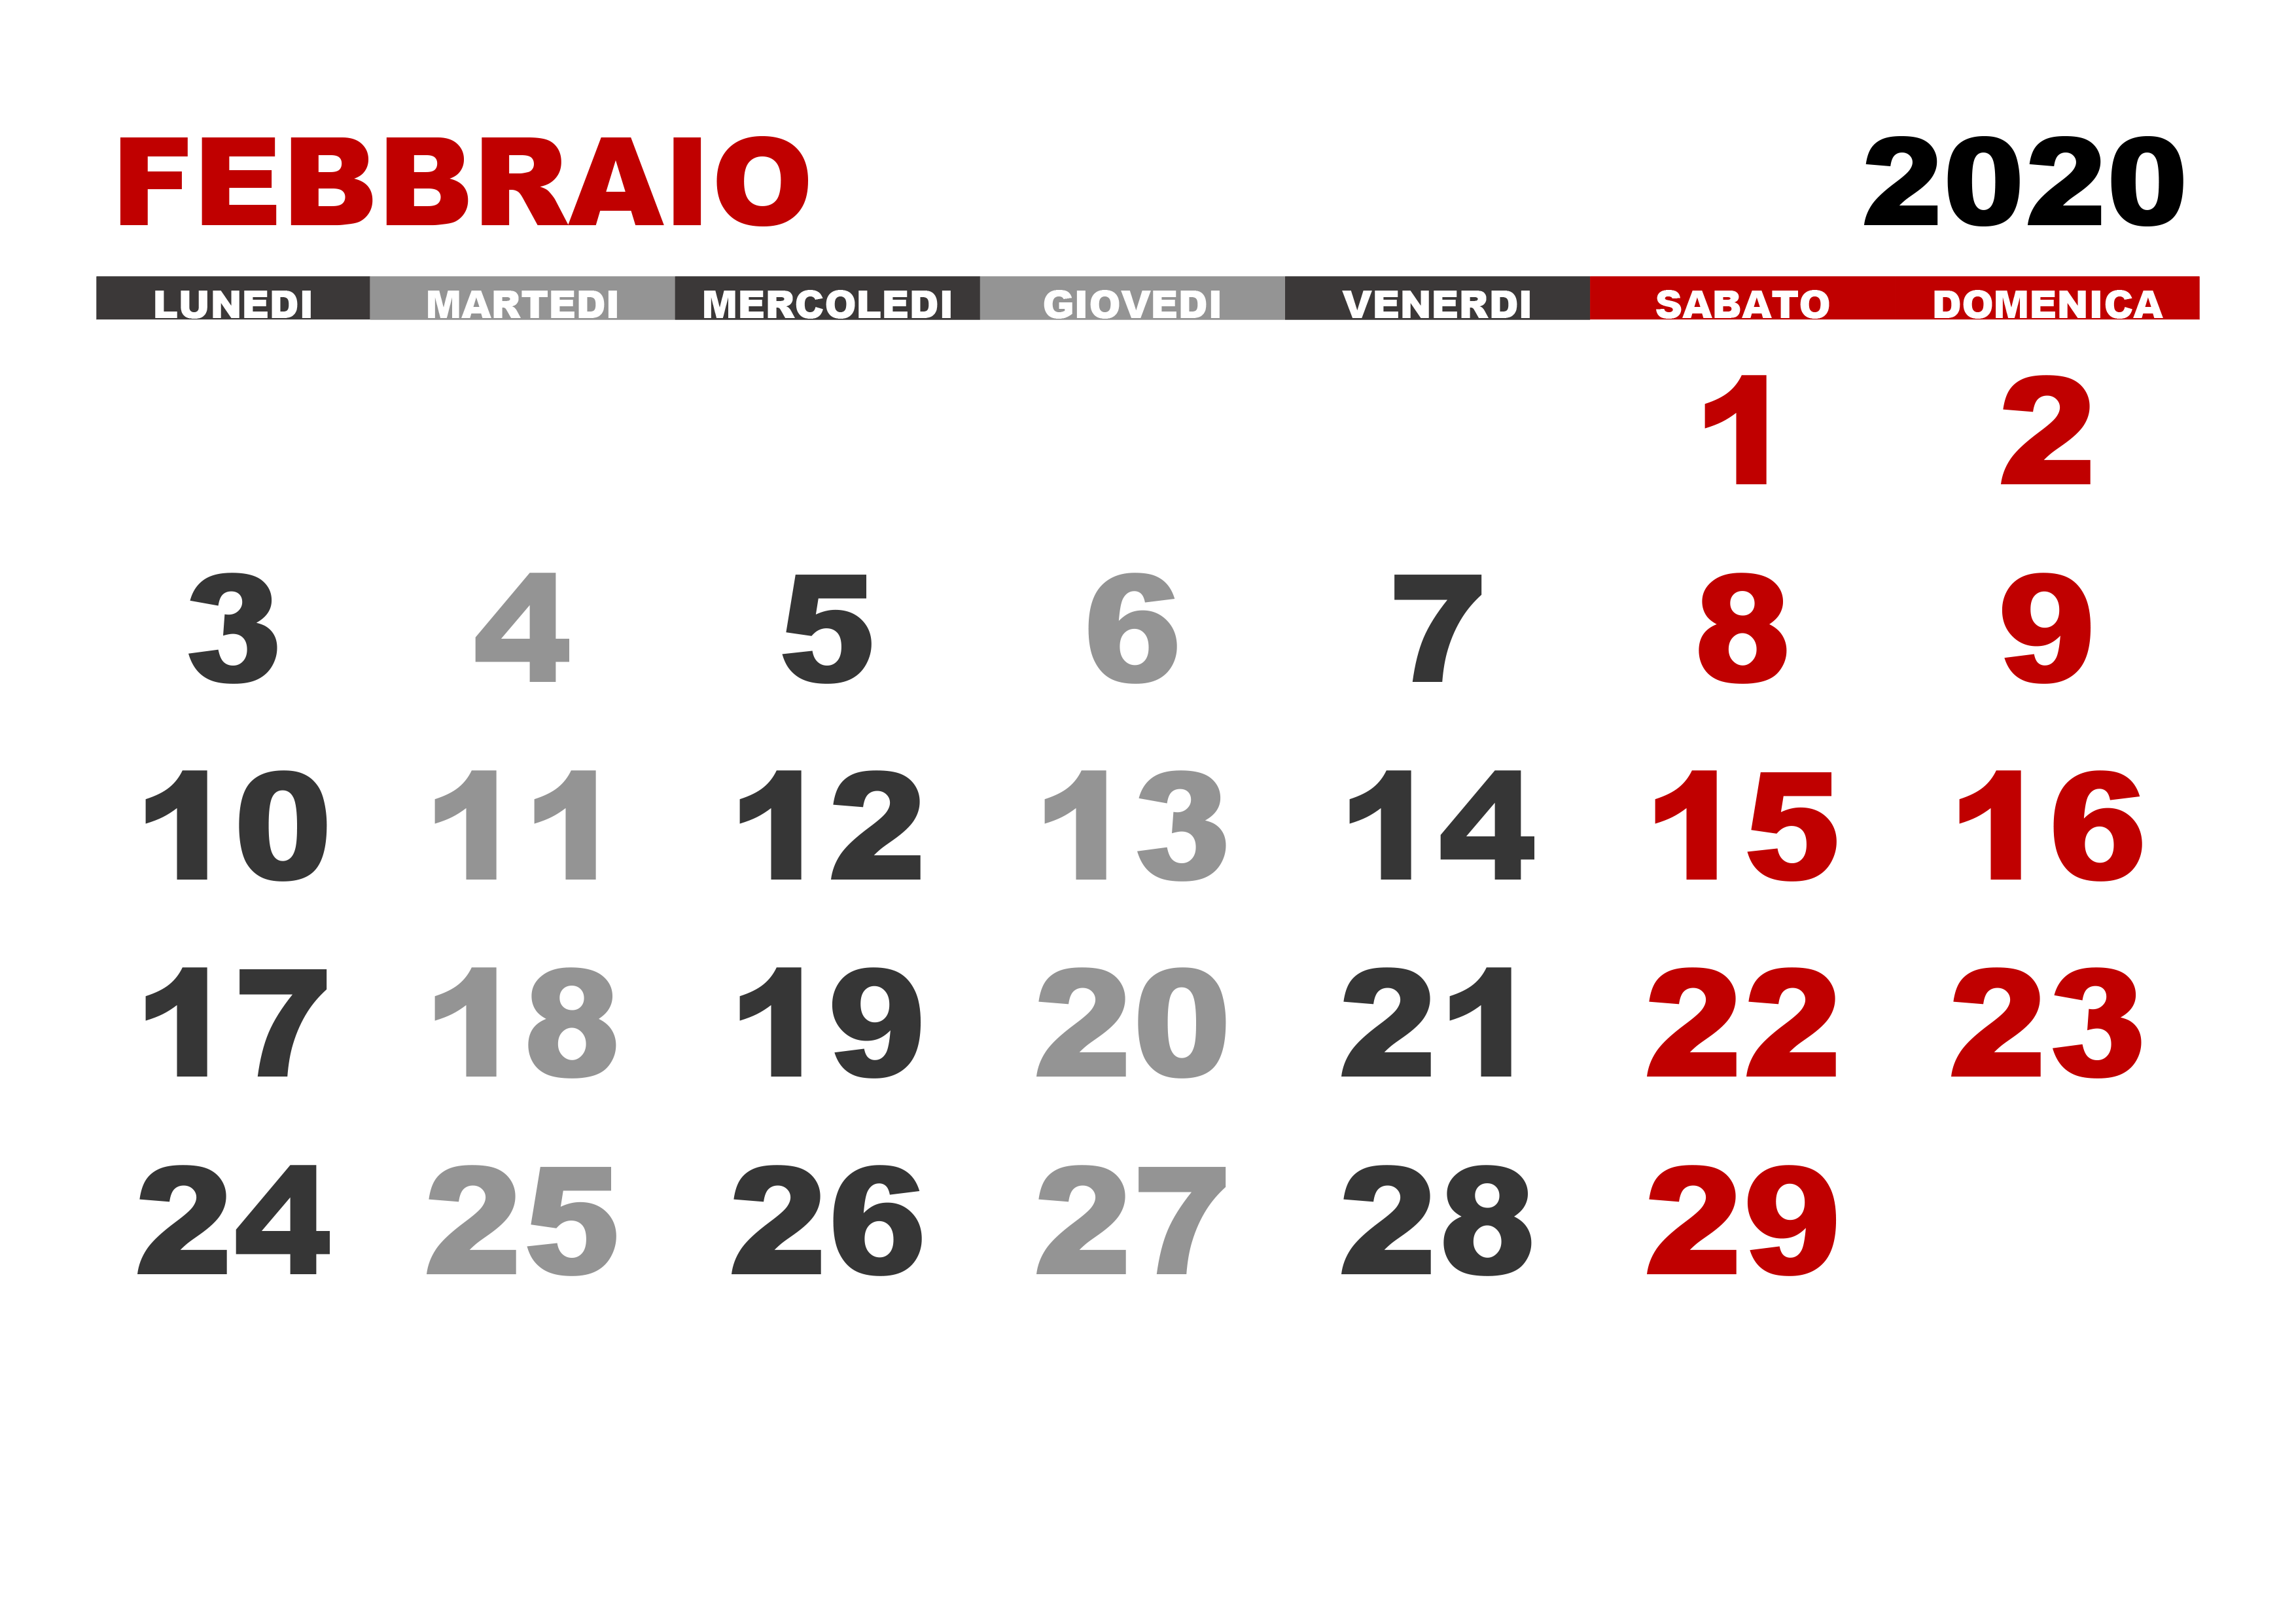 Calendario 2020 Pdf Stampabile.Calendario Febbraio 2020 Calendario Su